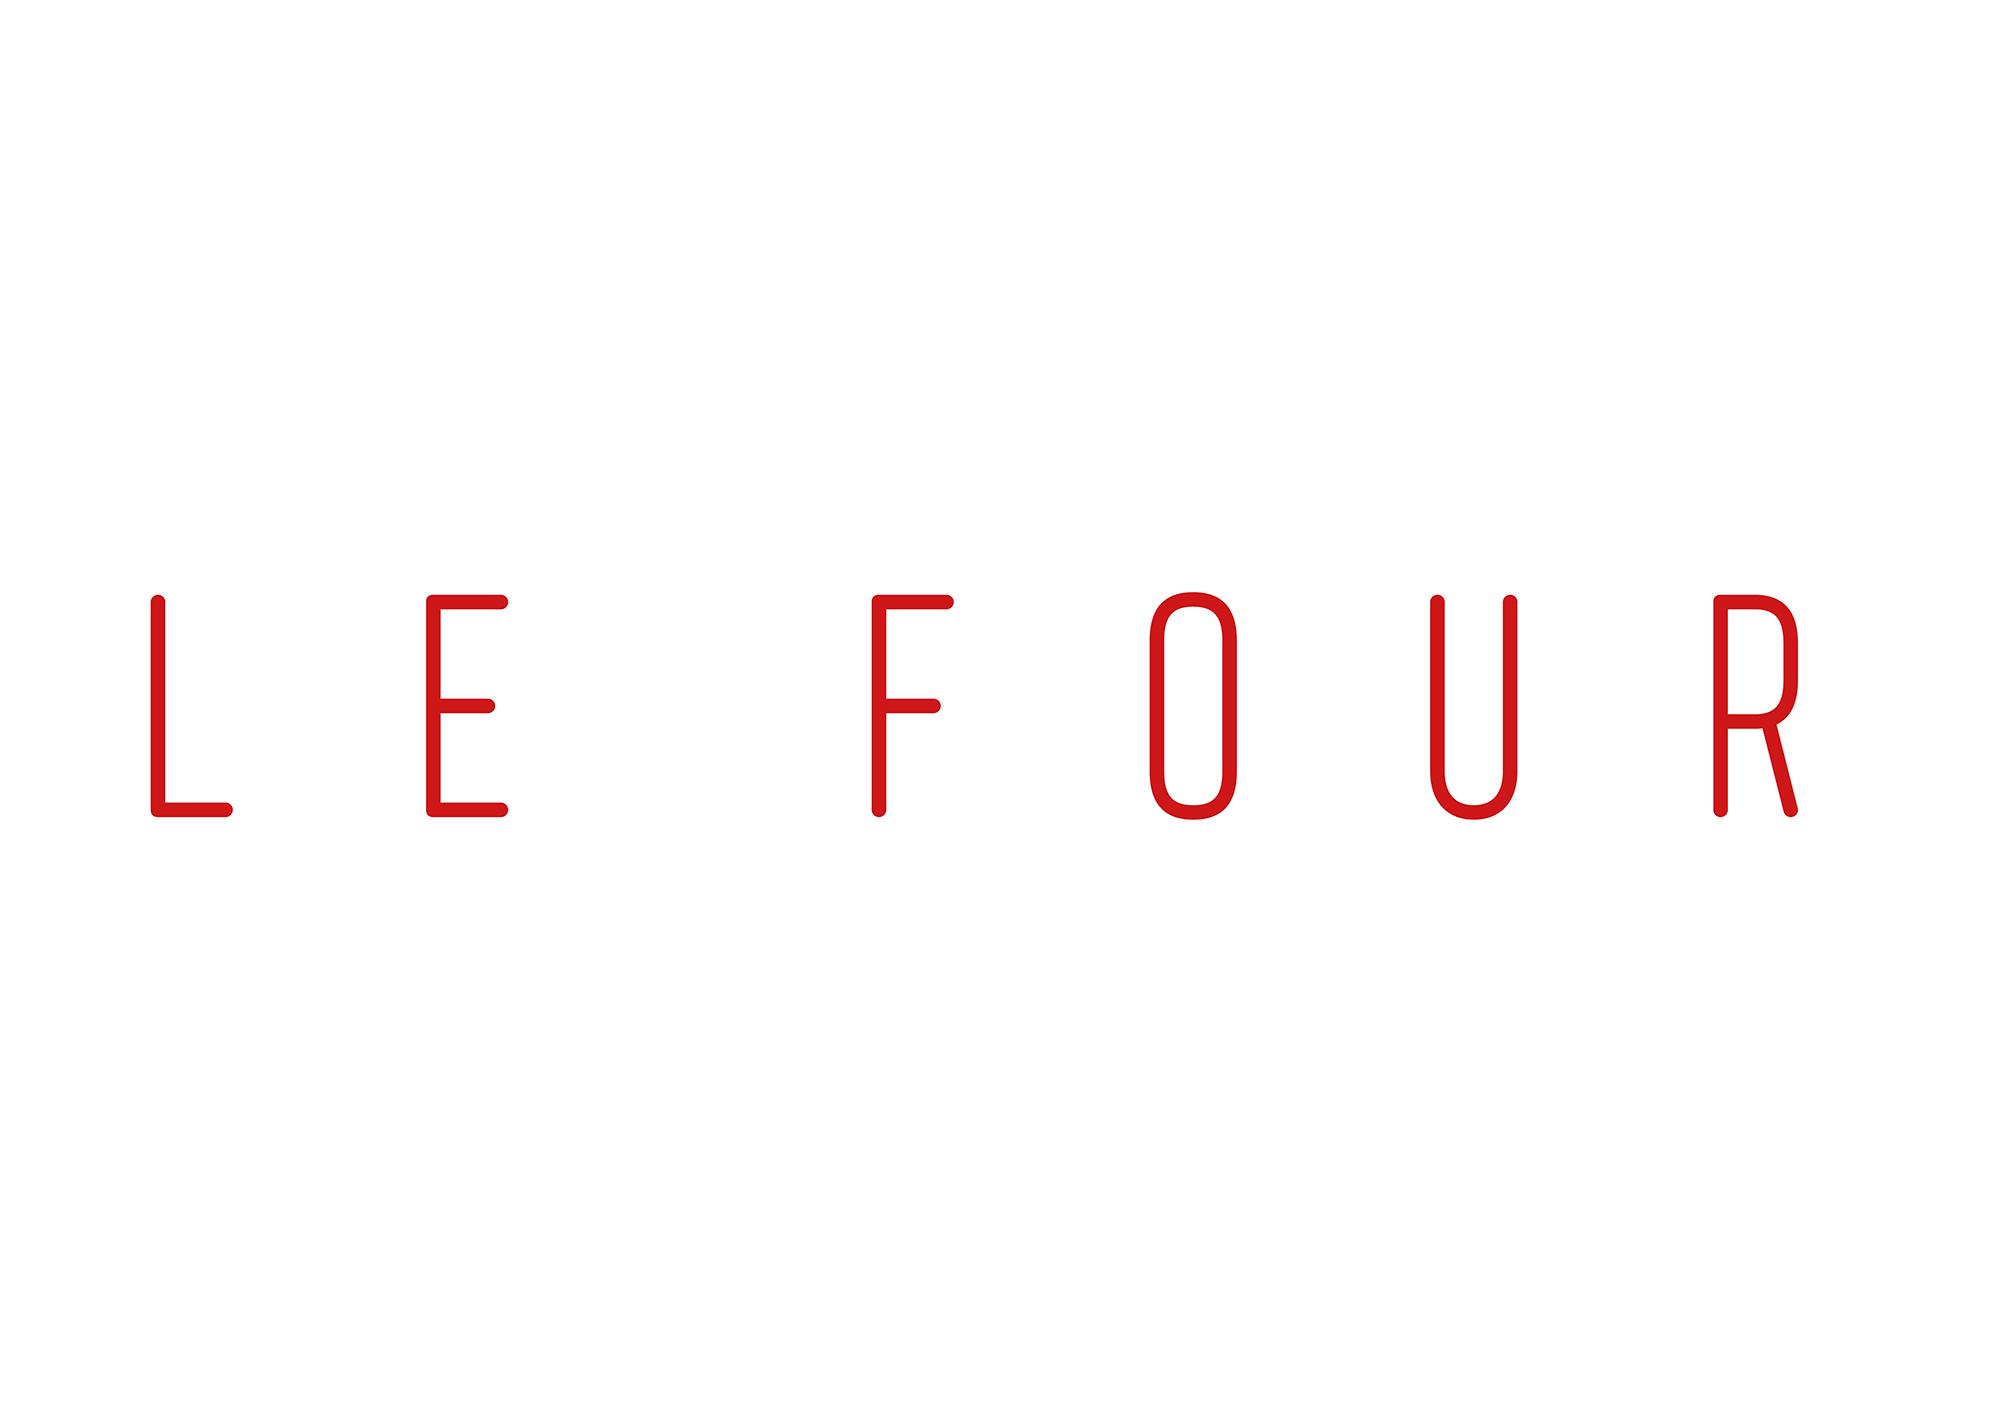 Cover image: Le Four